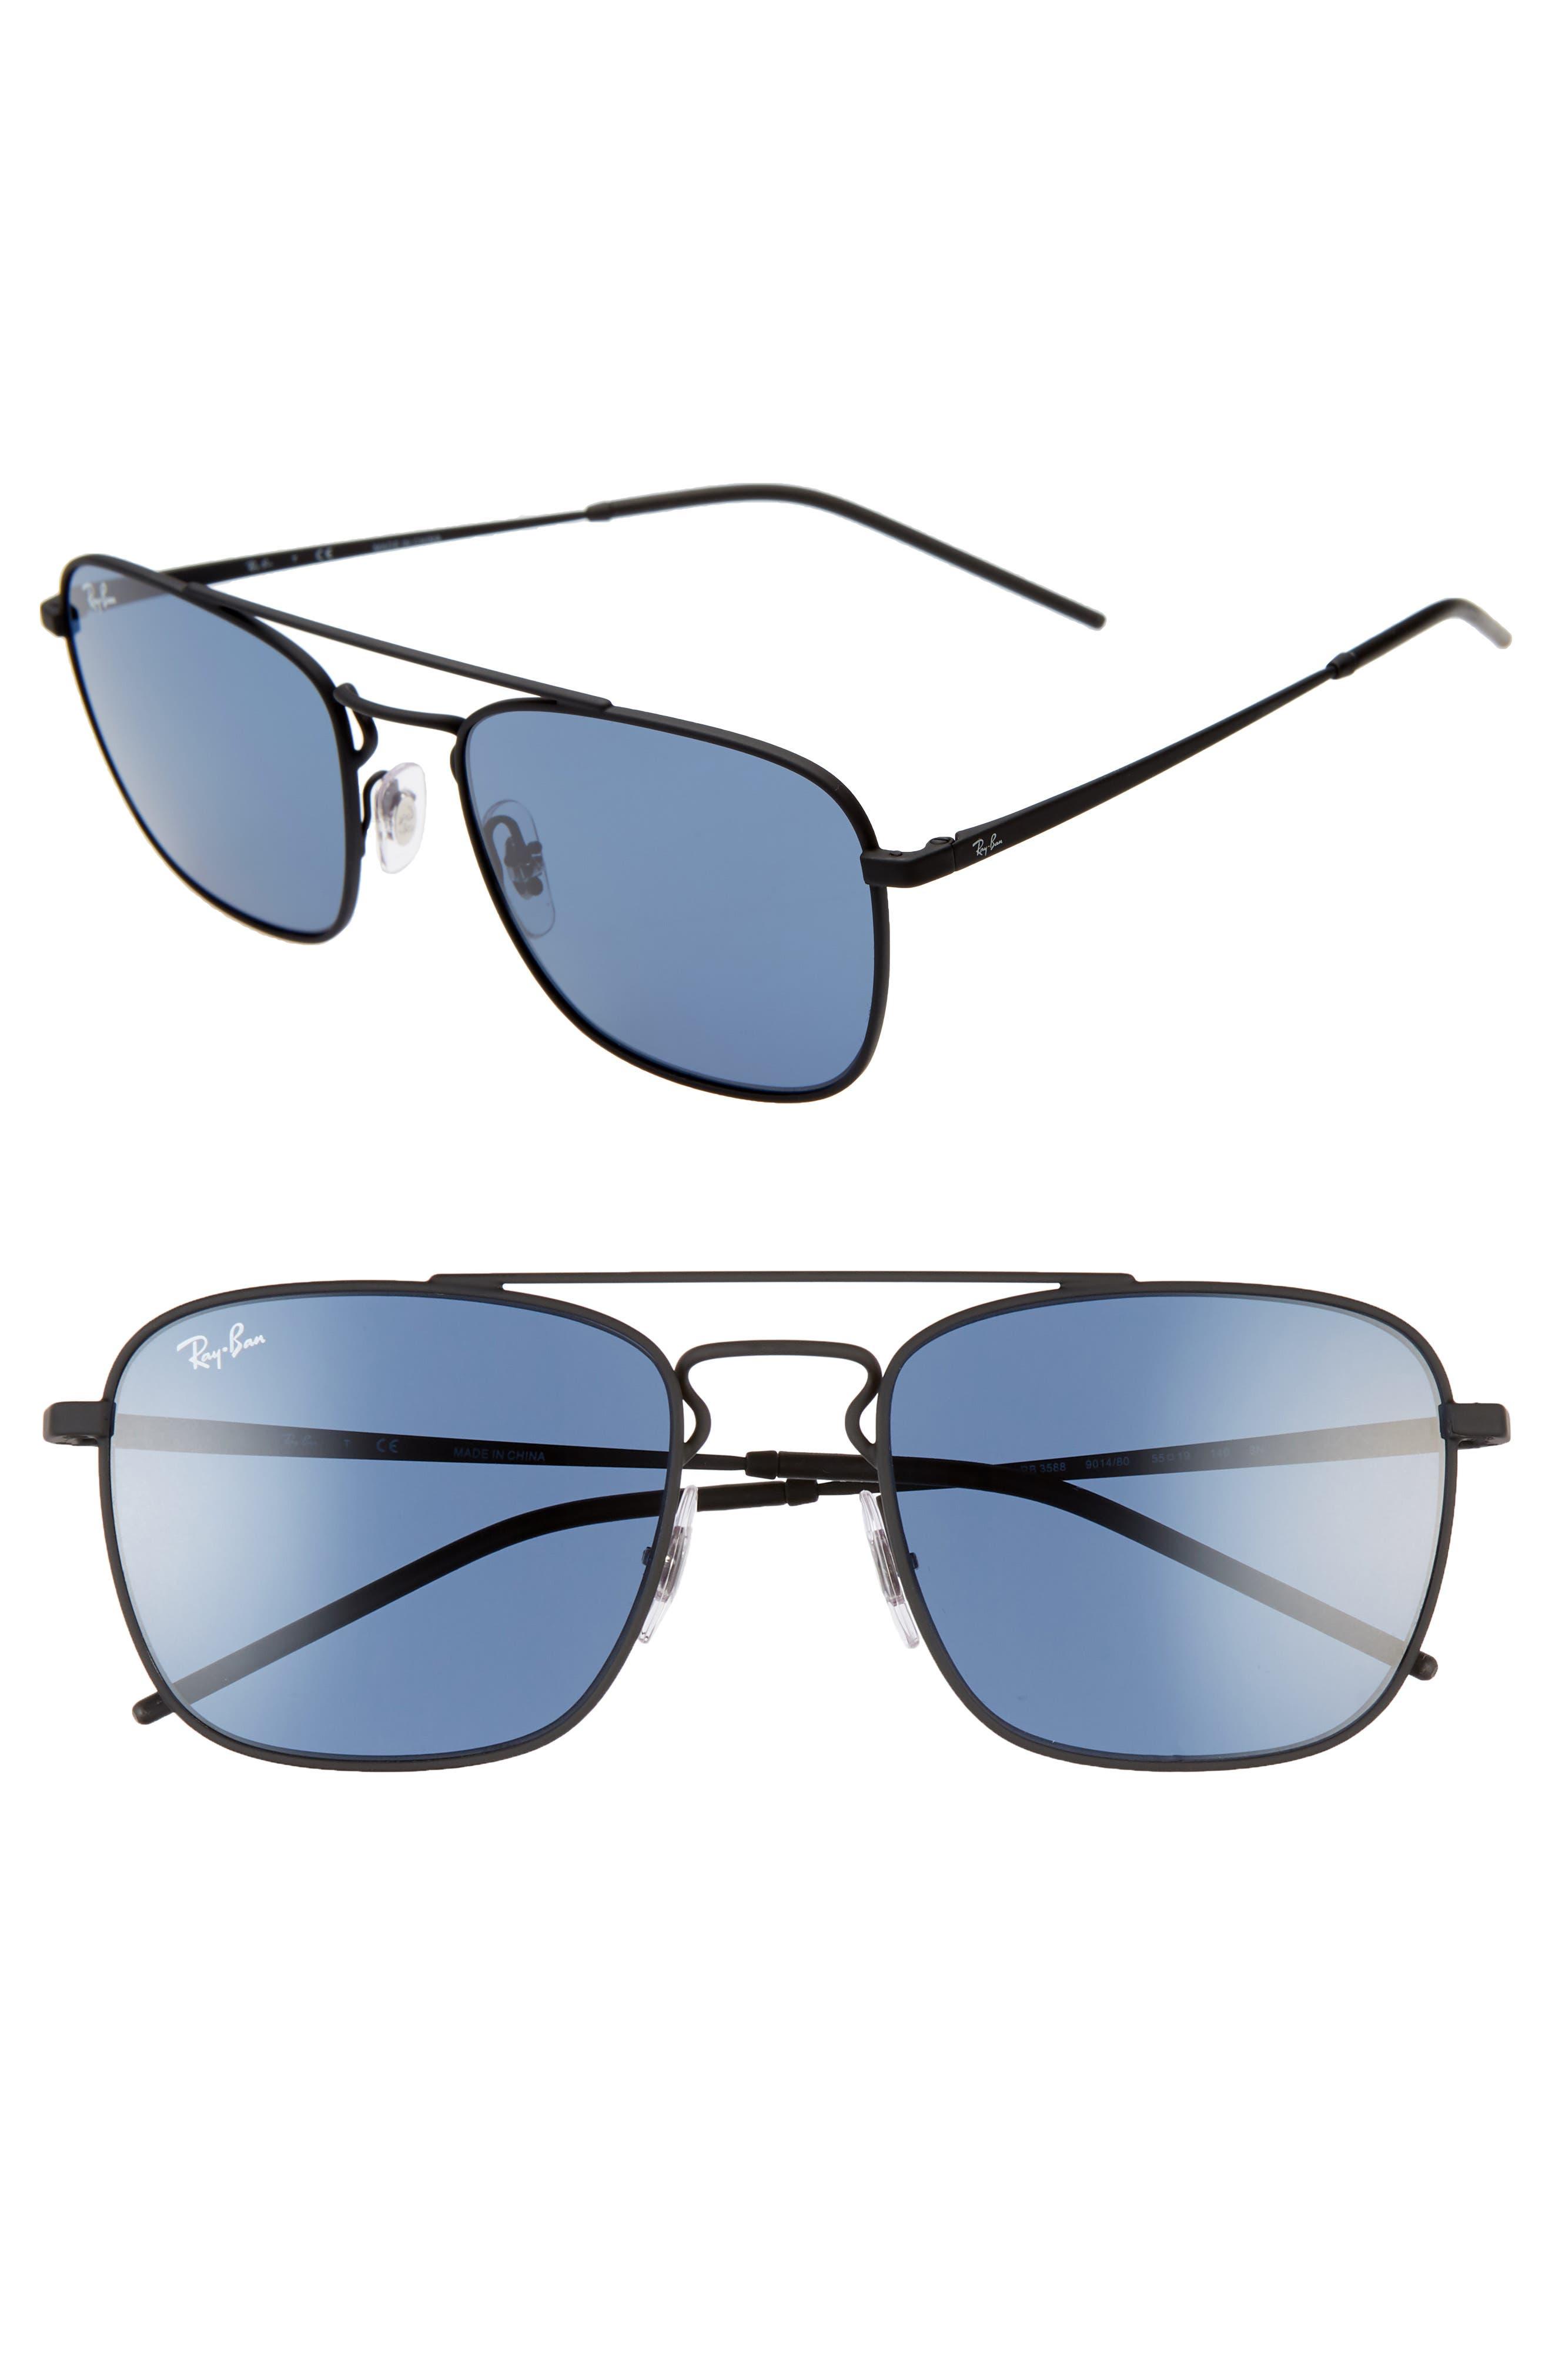 Ray-Ban 55Mm Square Sunglasses - Black